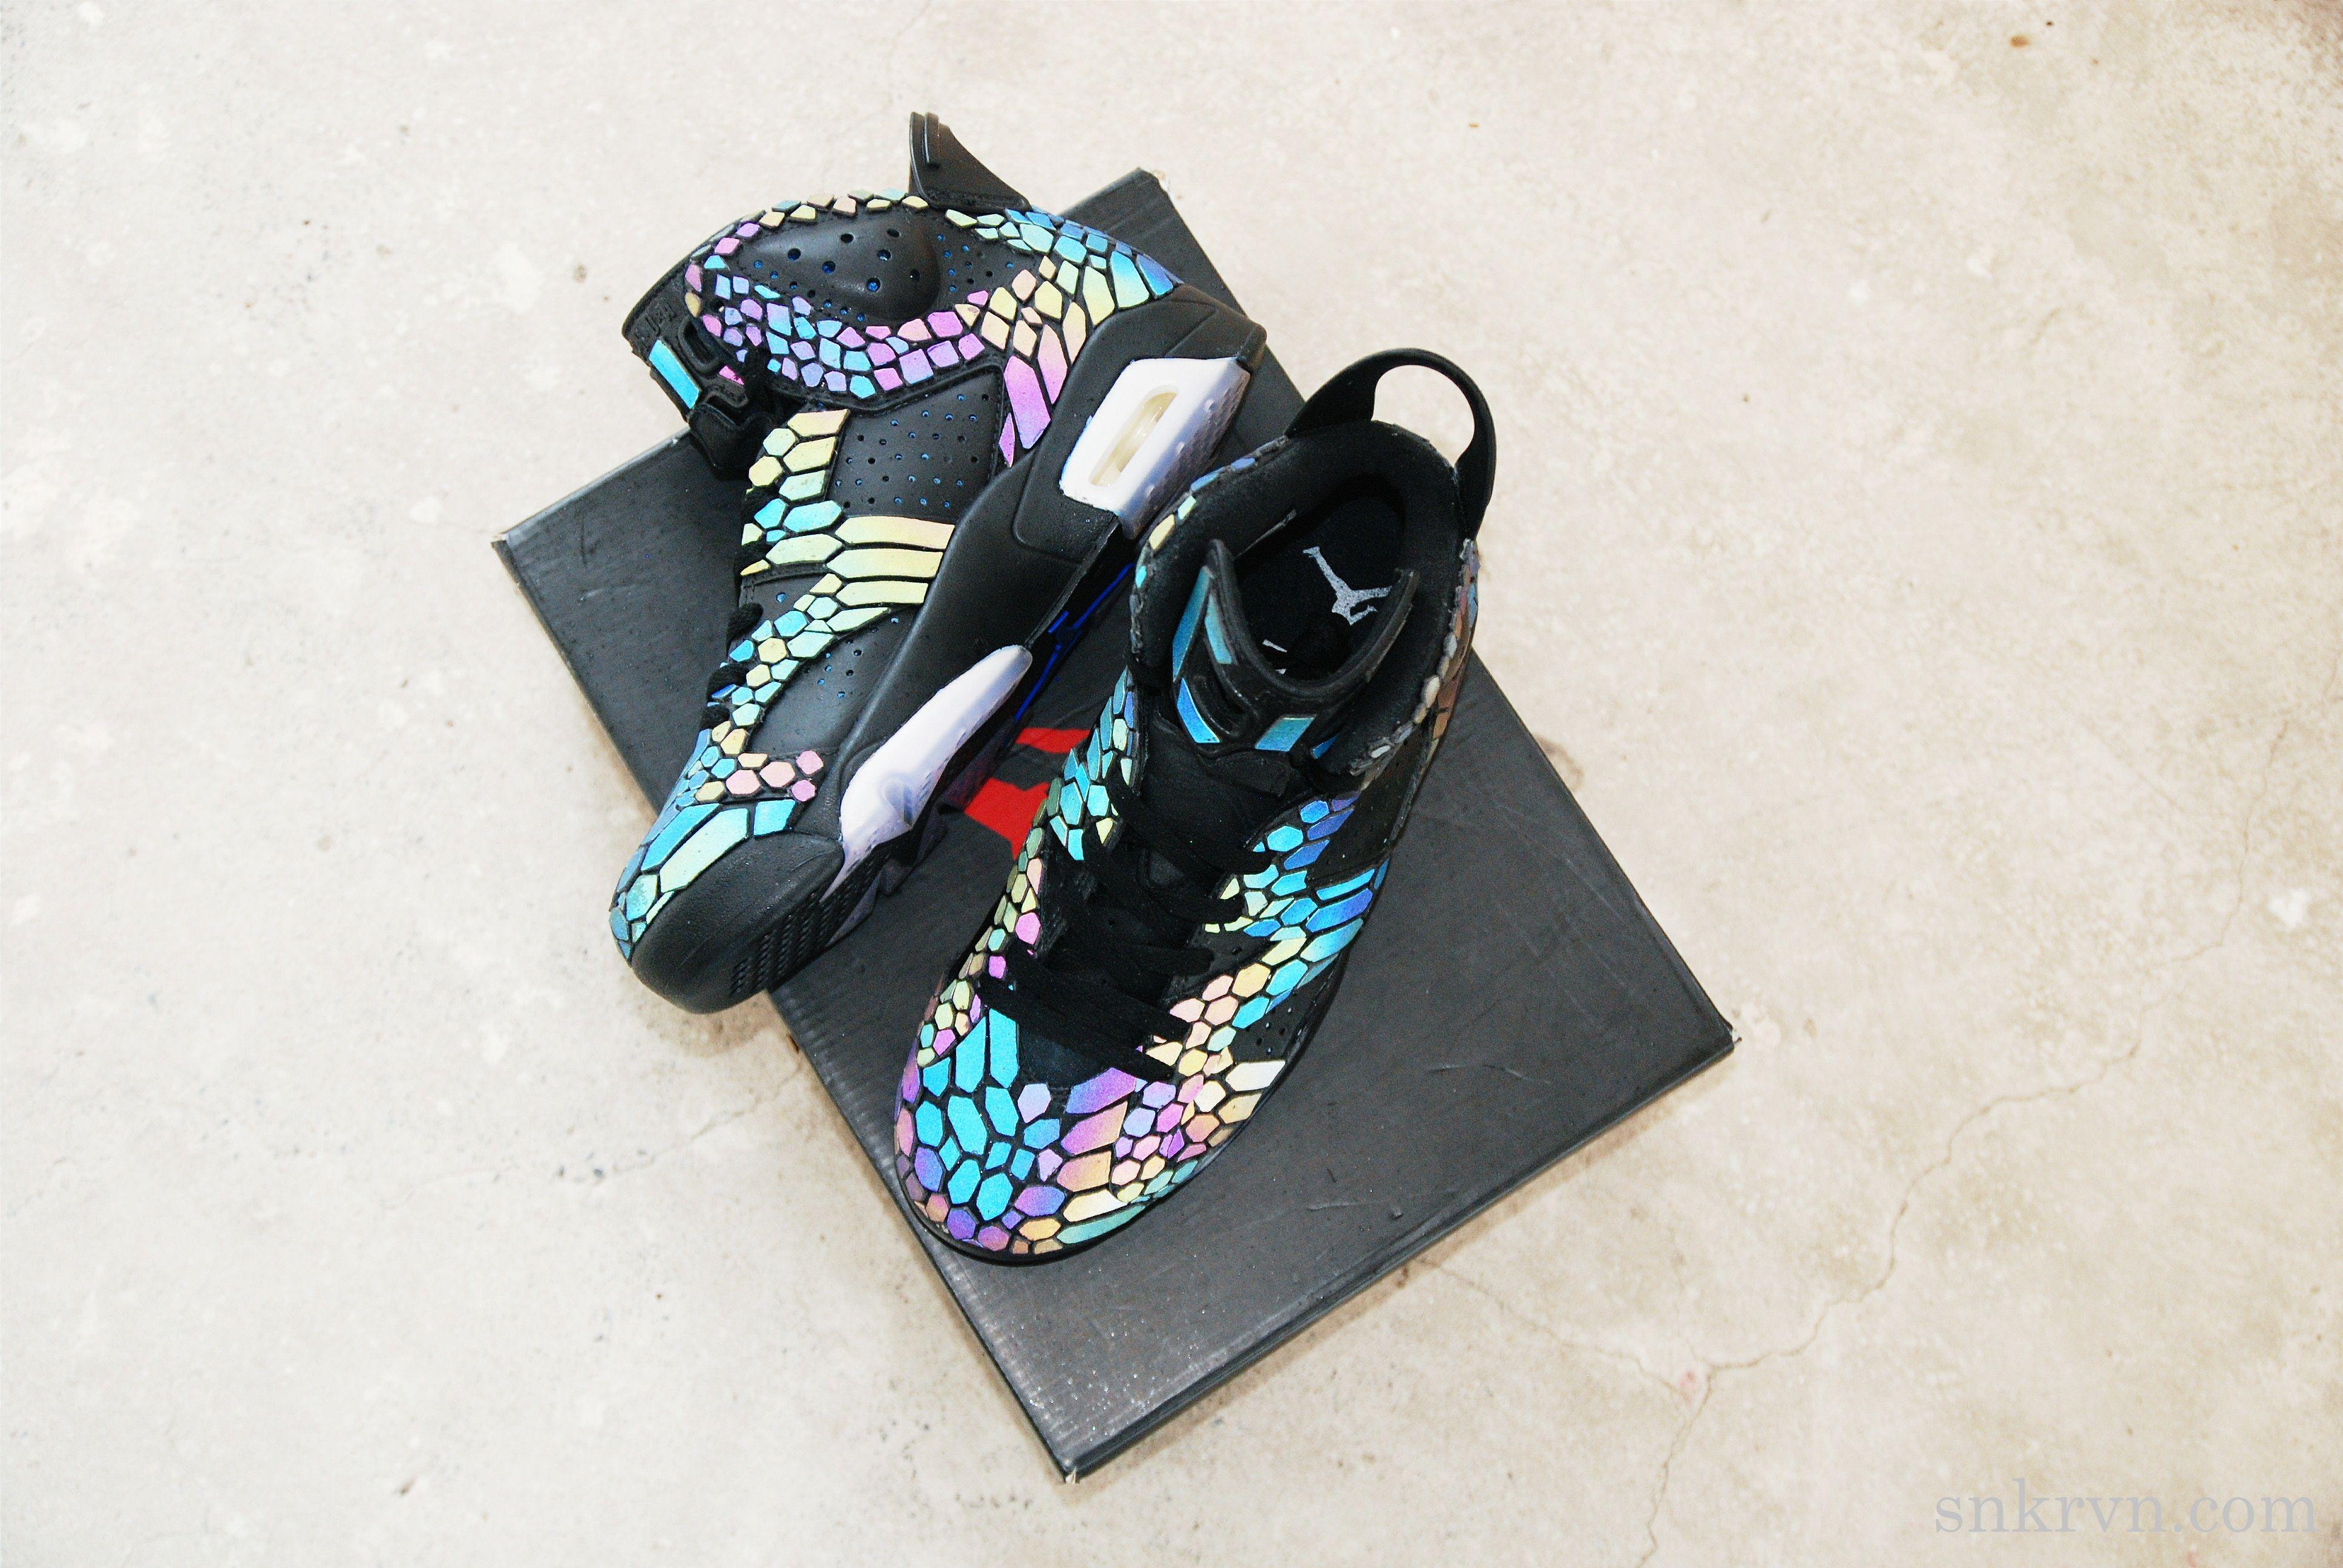 SNKR VIỆT NAM REVIEW Custom adidas, Adidas xeno, Air jordans